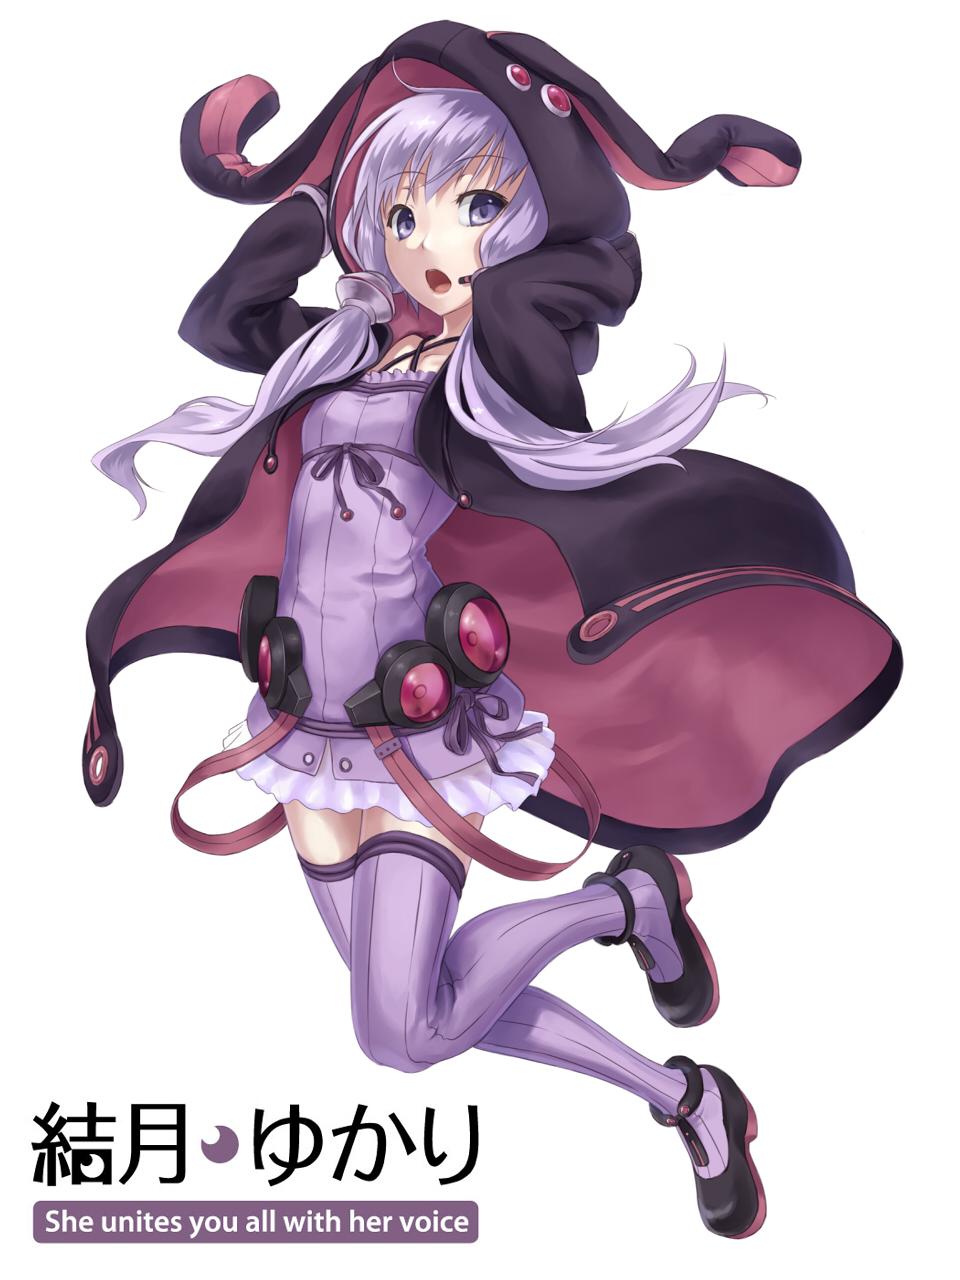 Mmd hatsune miku cosplay conejitos playboy dancing apple pie - 4 3